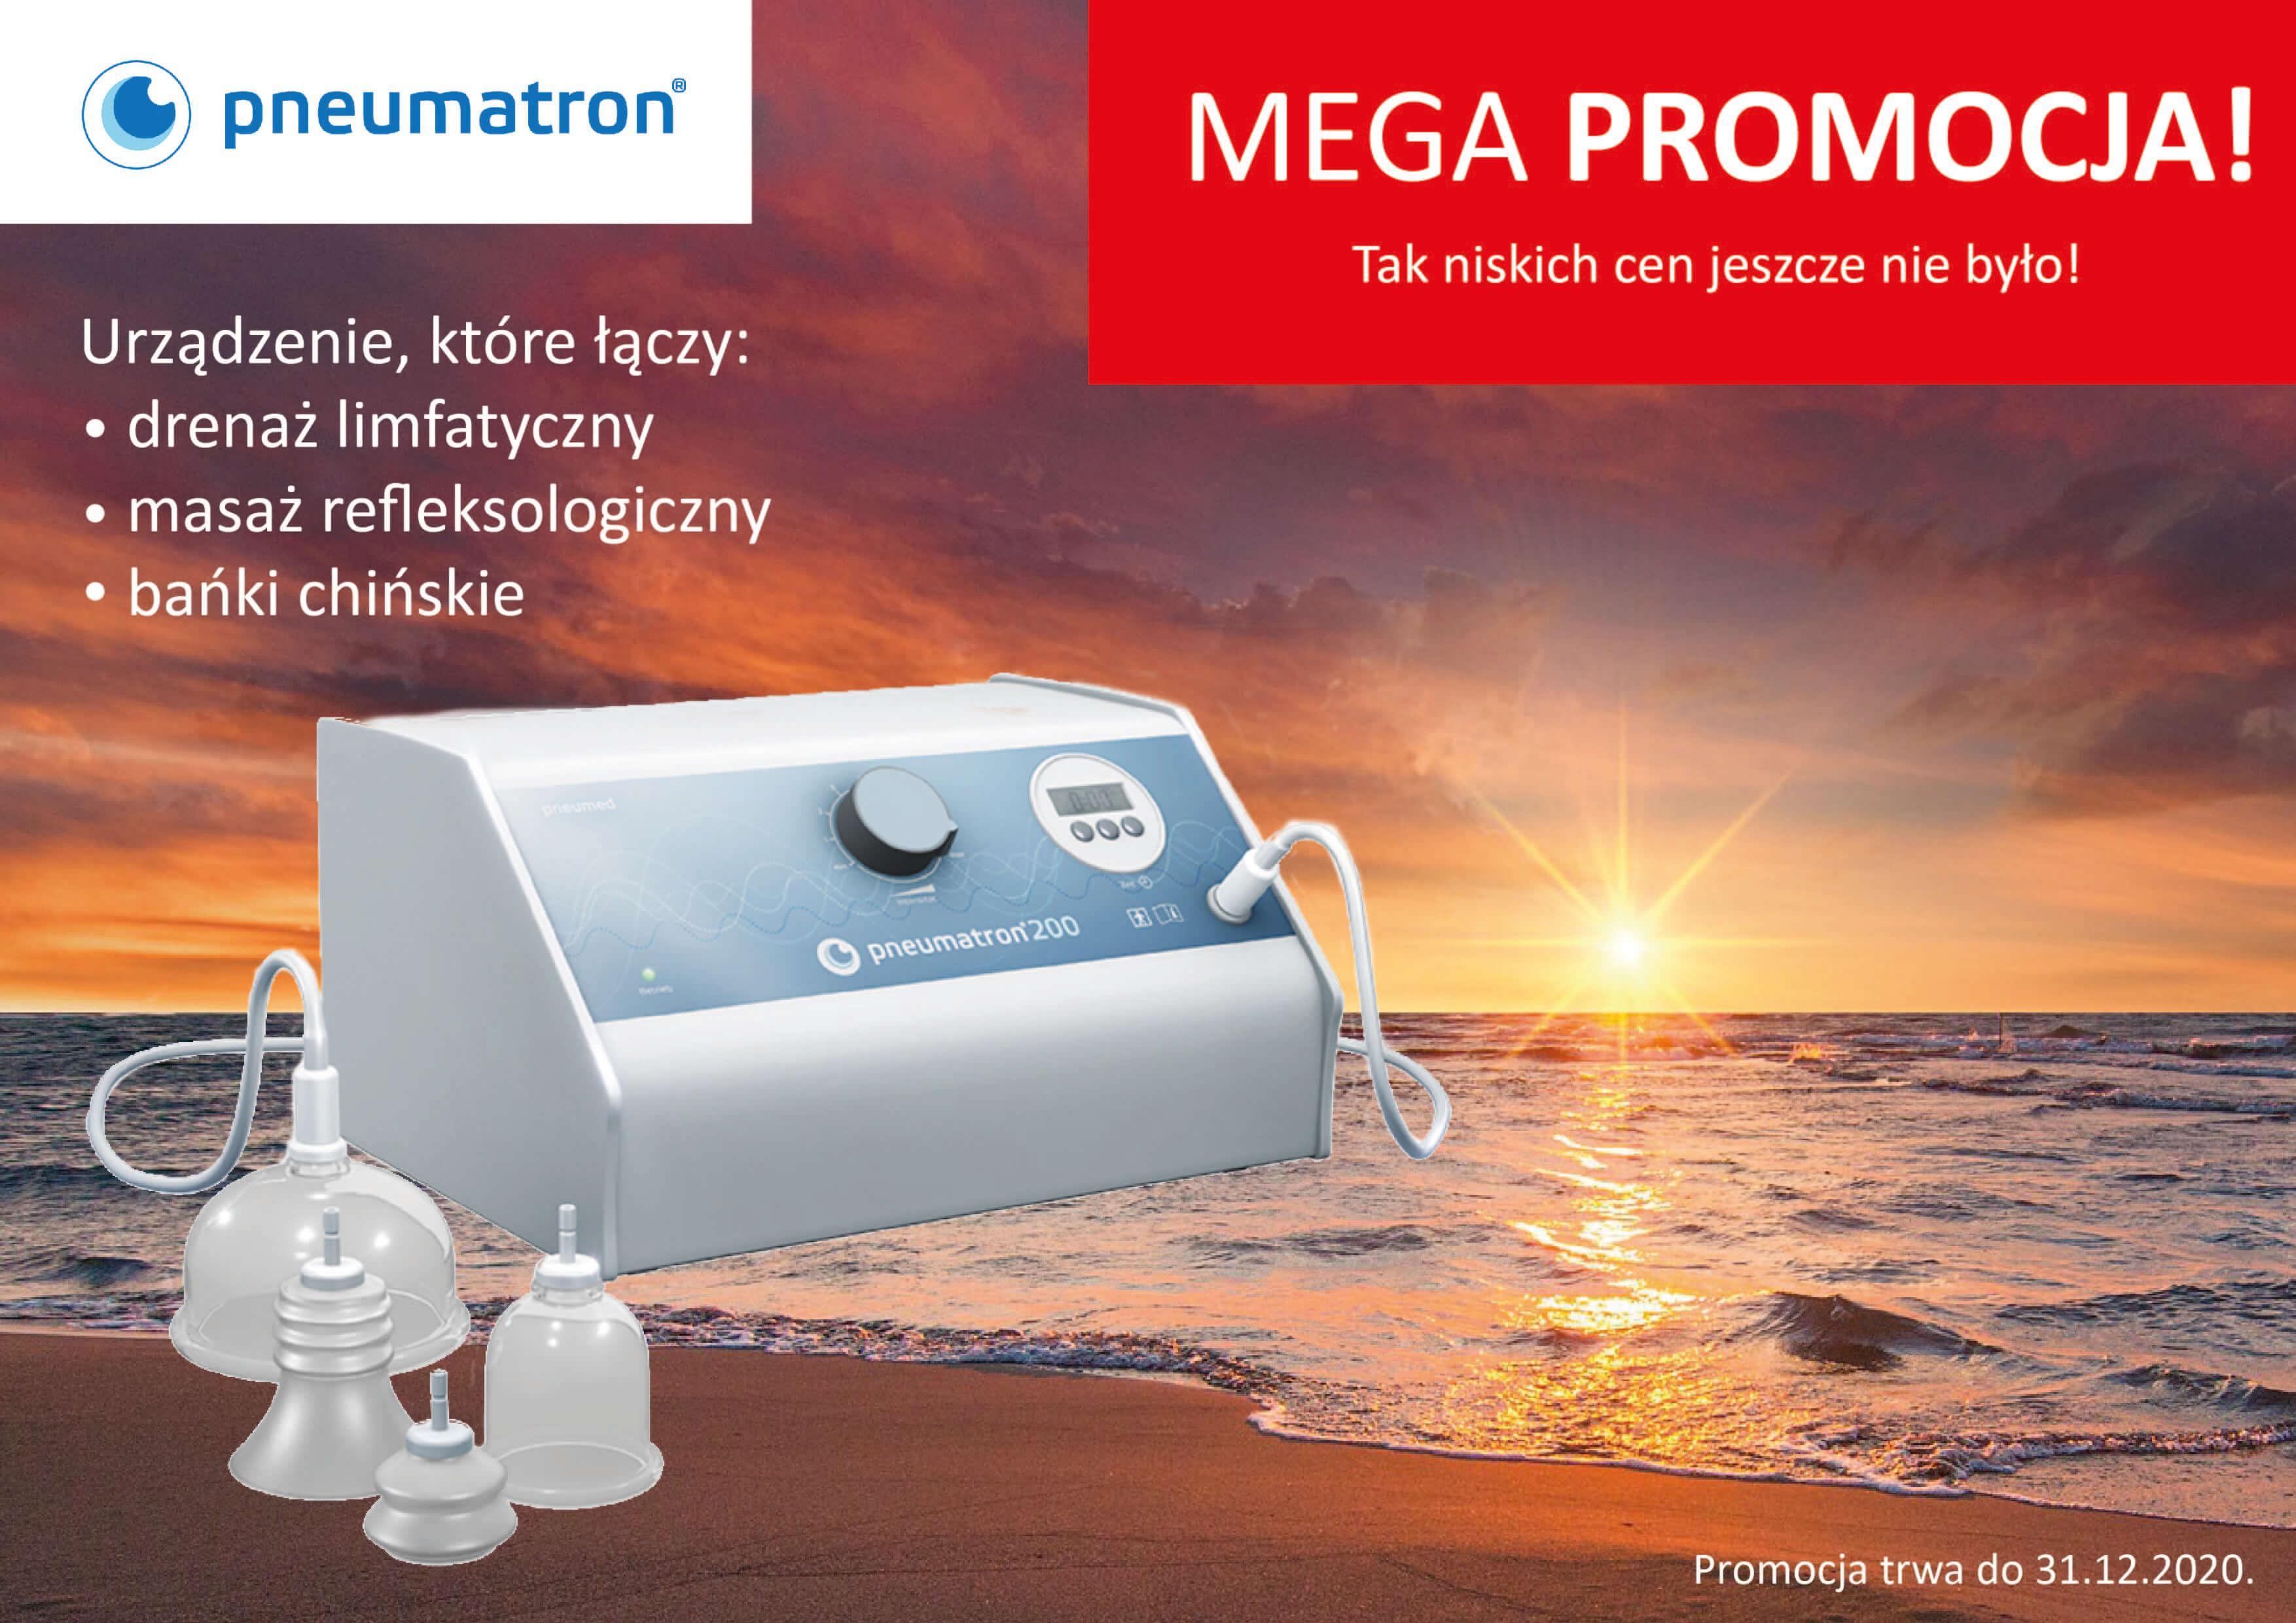 Pneumatron - promocja do końca roku